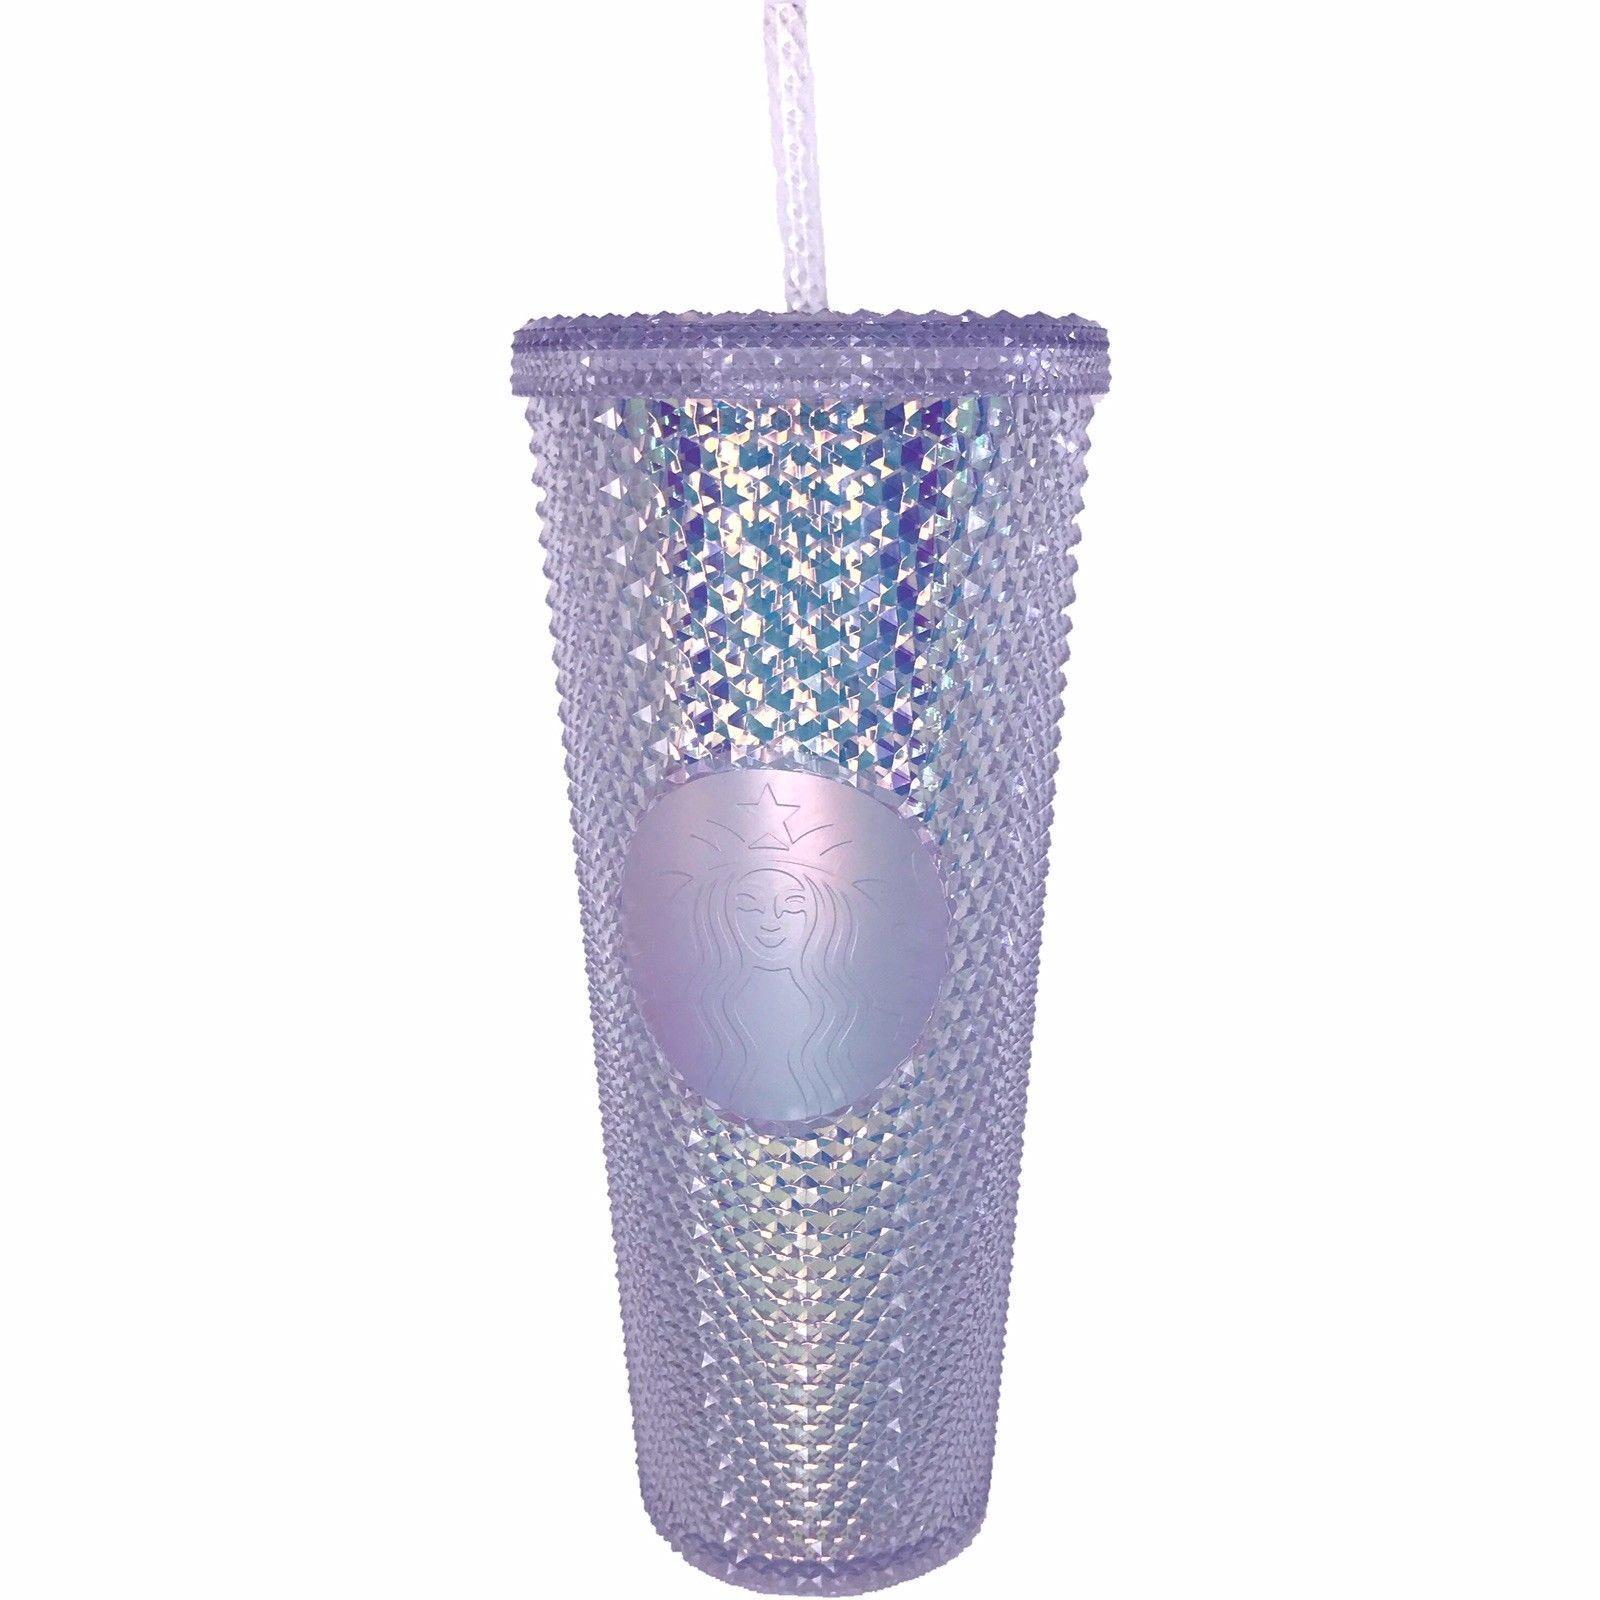 Starbucks Pink Rainbow Iridescent Hologram Tumbler cold Cup 24OZ holographic